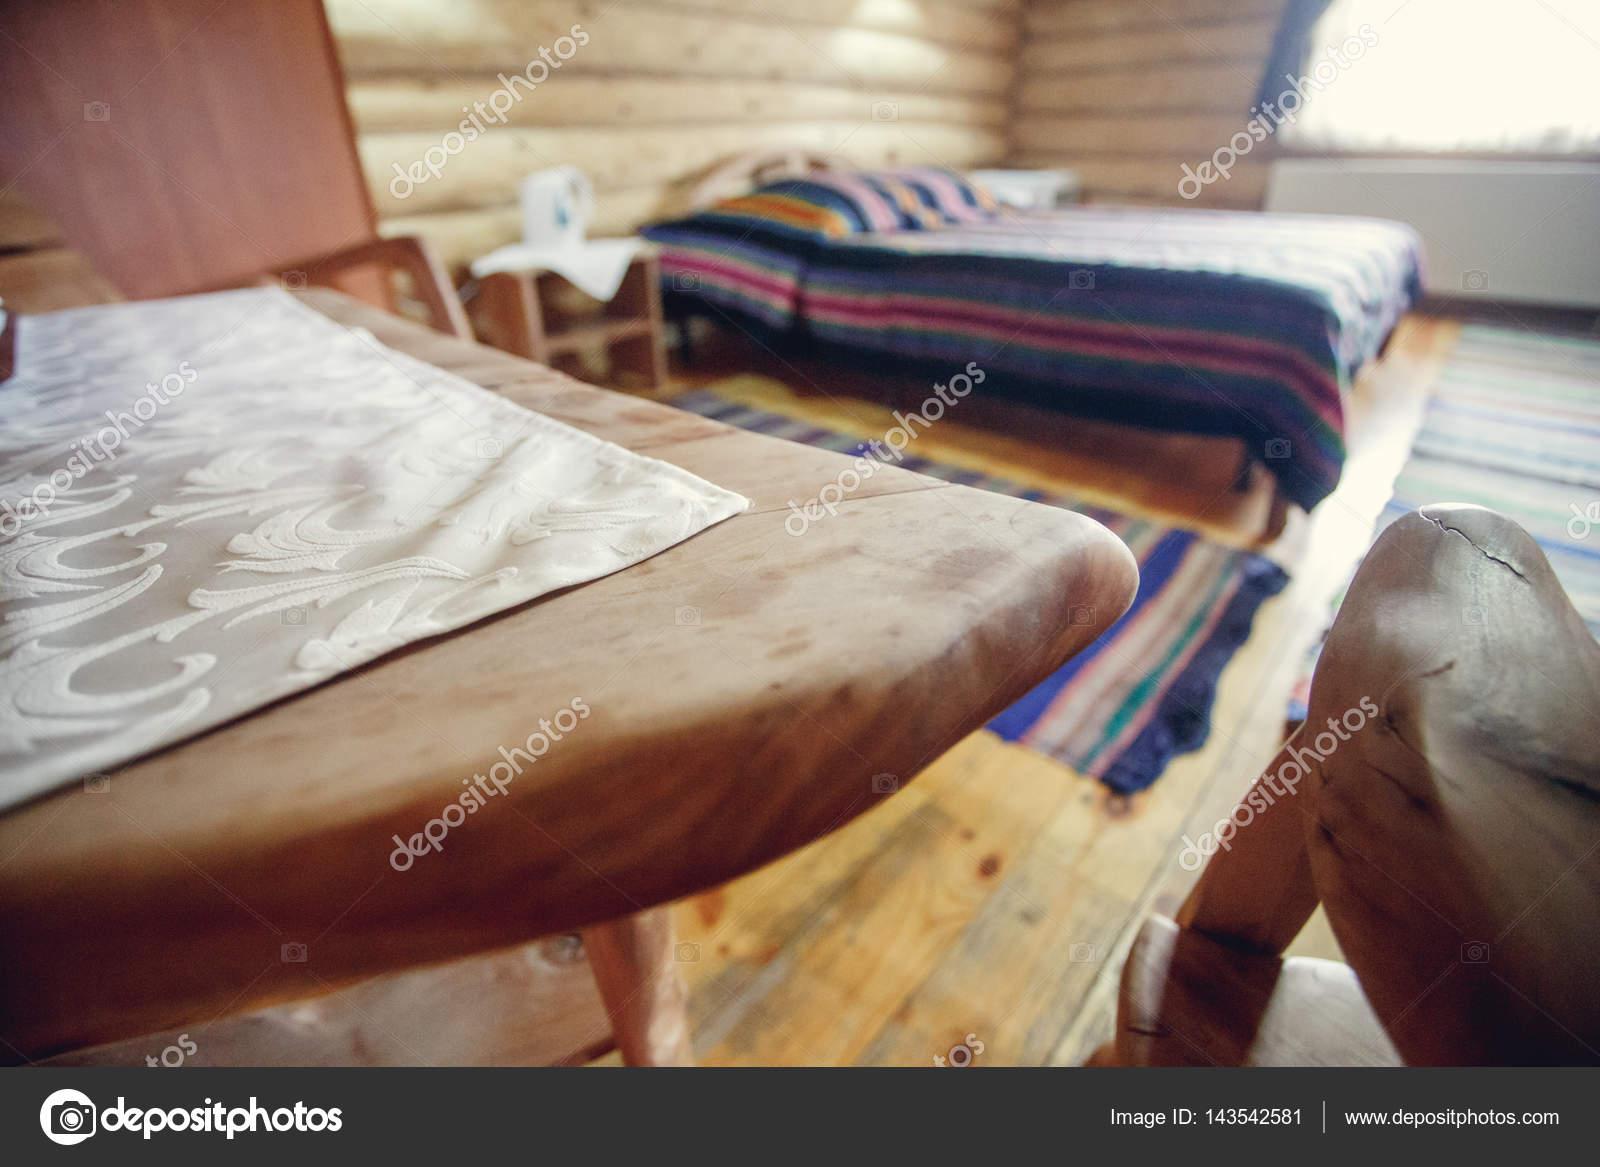 Modernes Haus interior.living Raum Teil des Hauses. Abstrakt ...